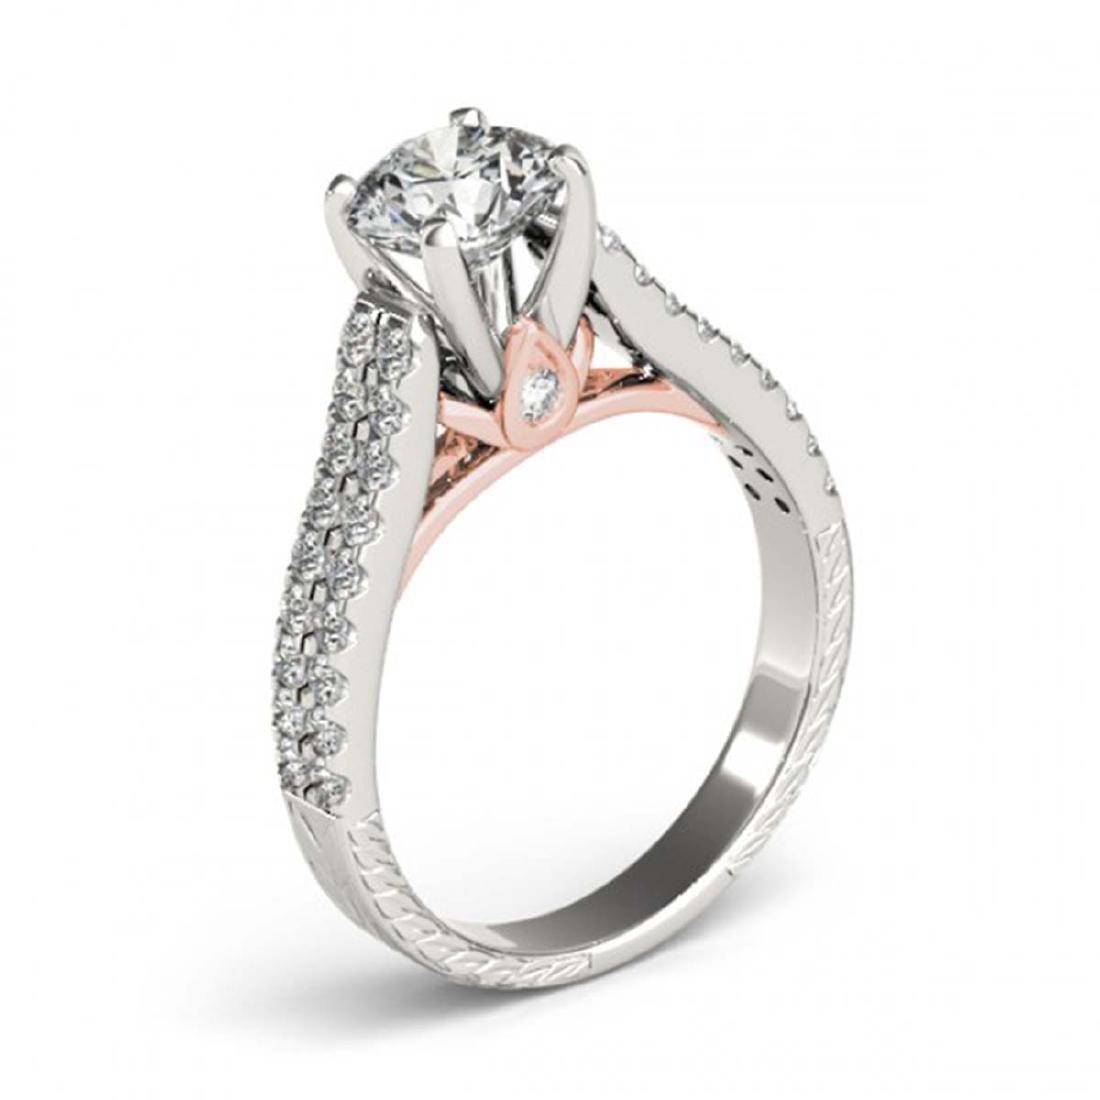 1.61 CTW Certified VS/SI Diamond Pave Ring 14K White & - 3